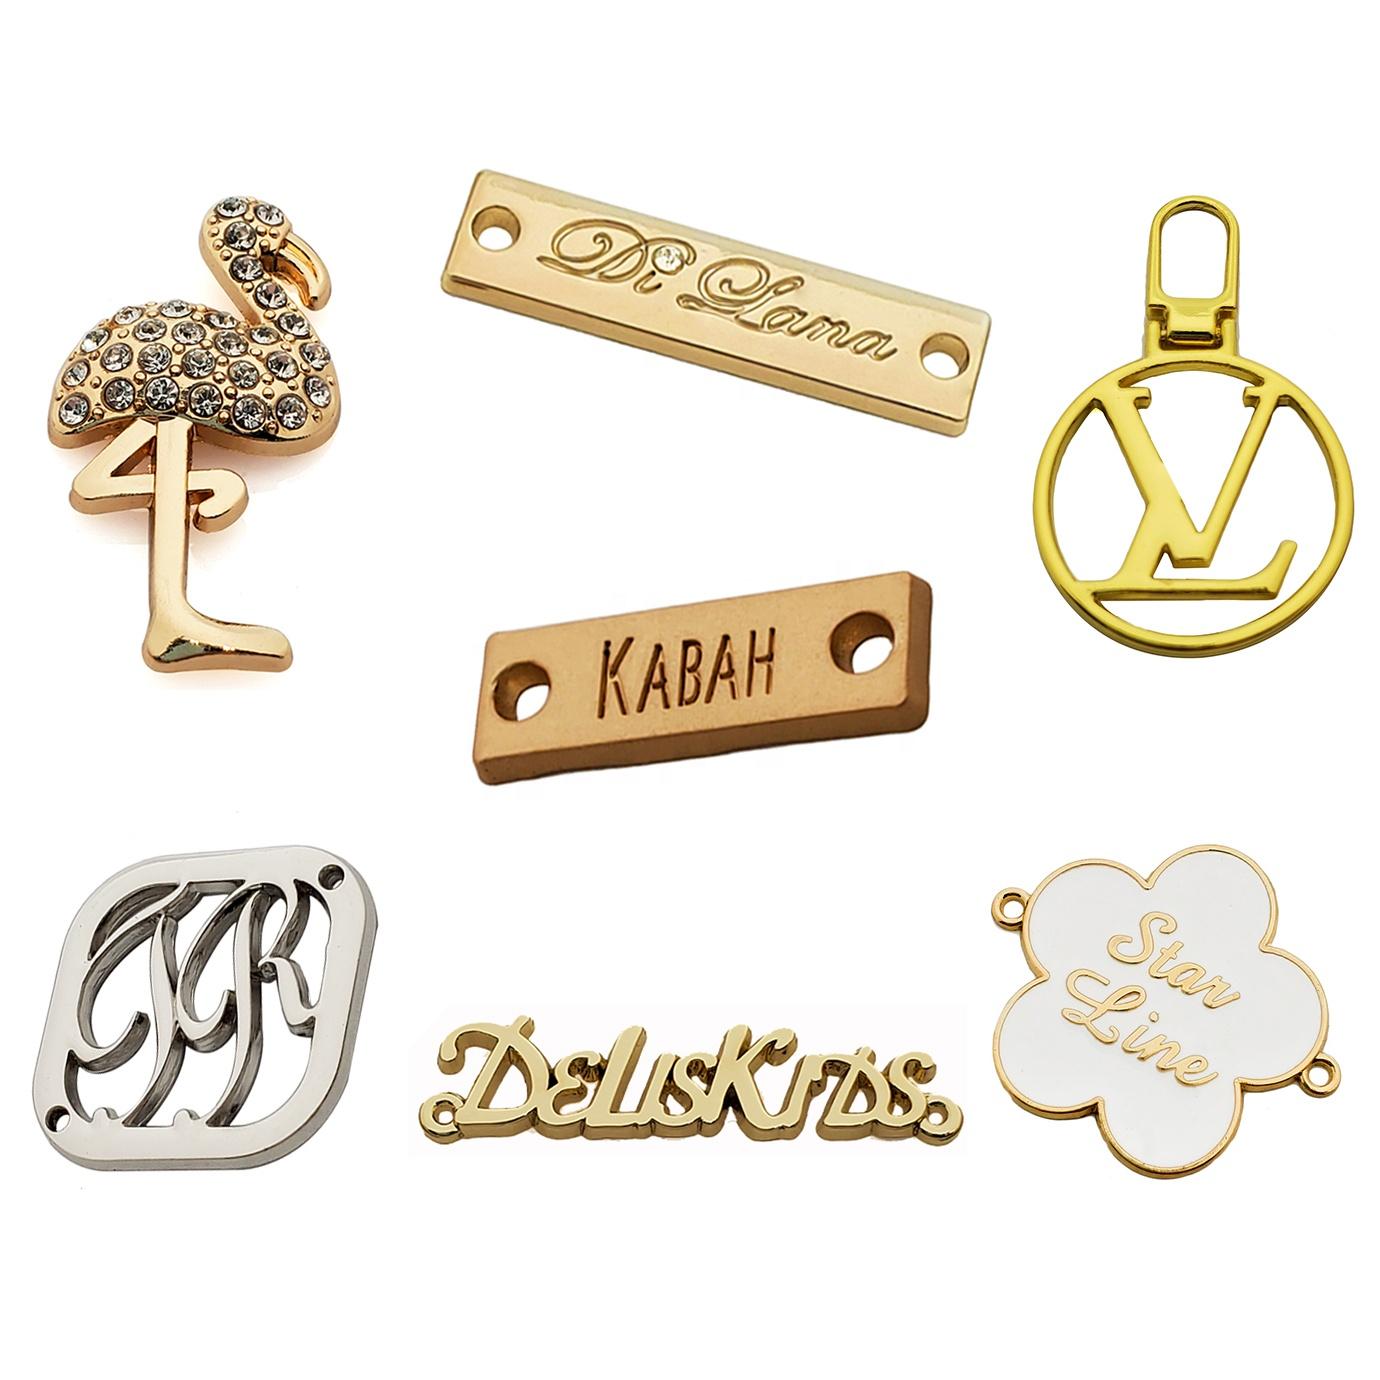 designer engraved sculpture Clothing metal label Accessories custom metal bag label adhesive brand logo labels